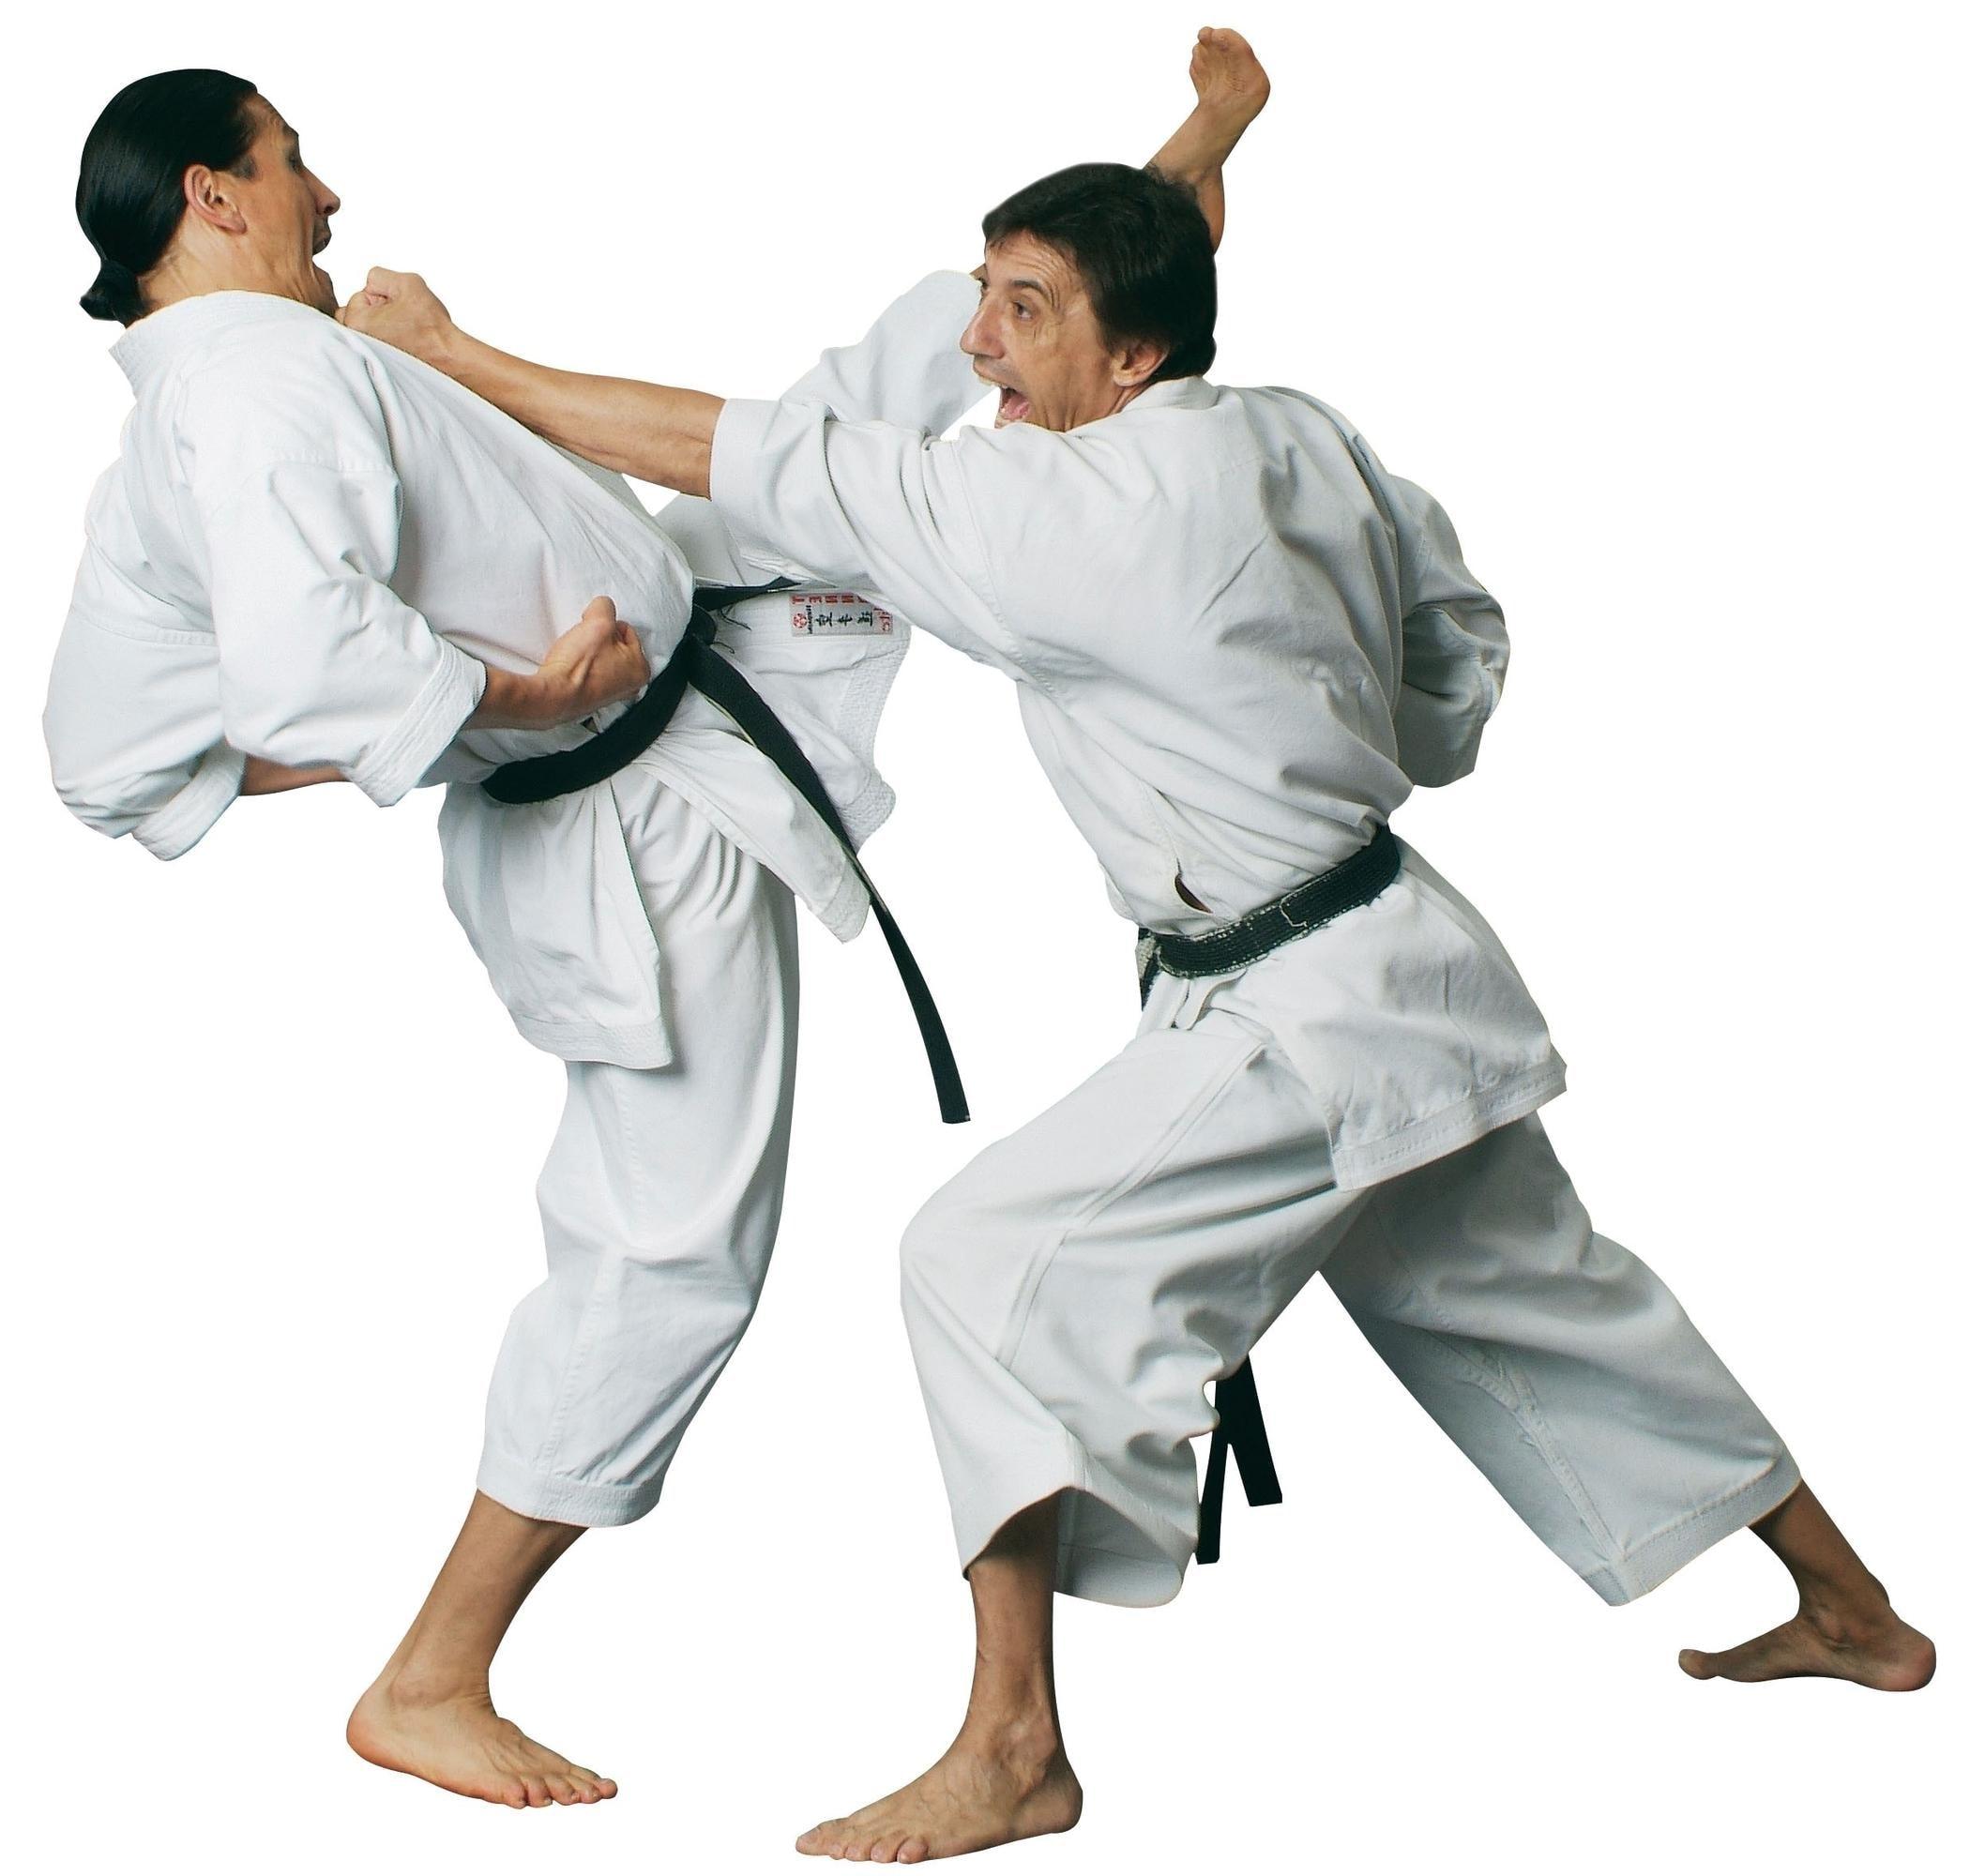 karate dream meaning, dream about karate, karate dream interpretation, seeing in a dream karate